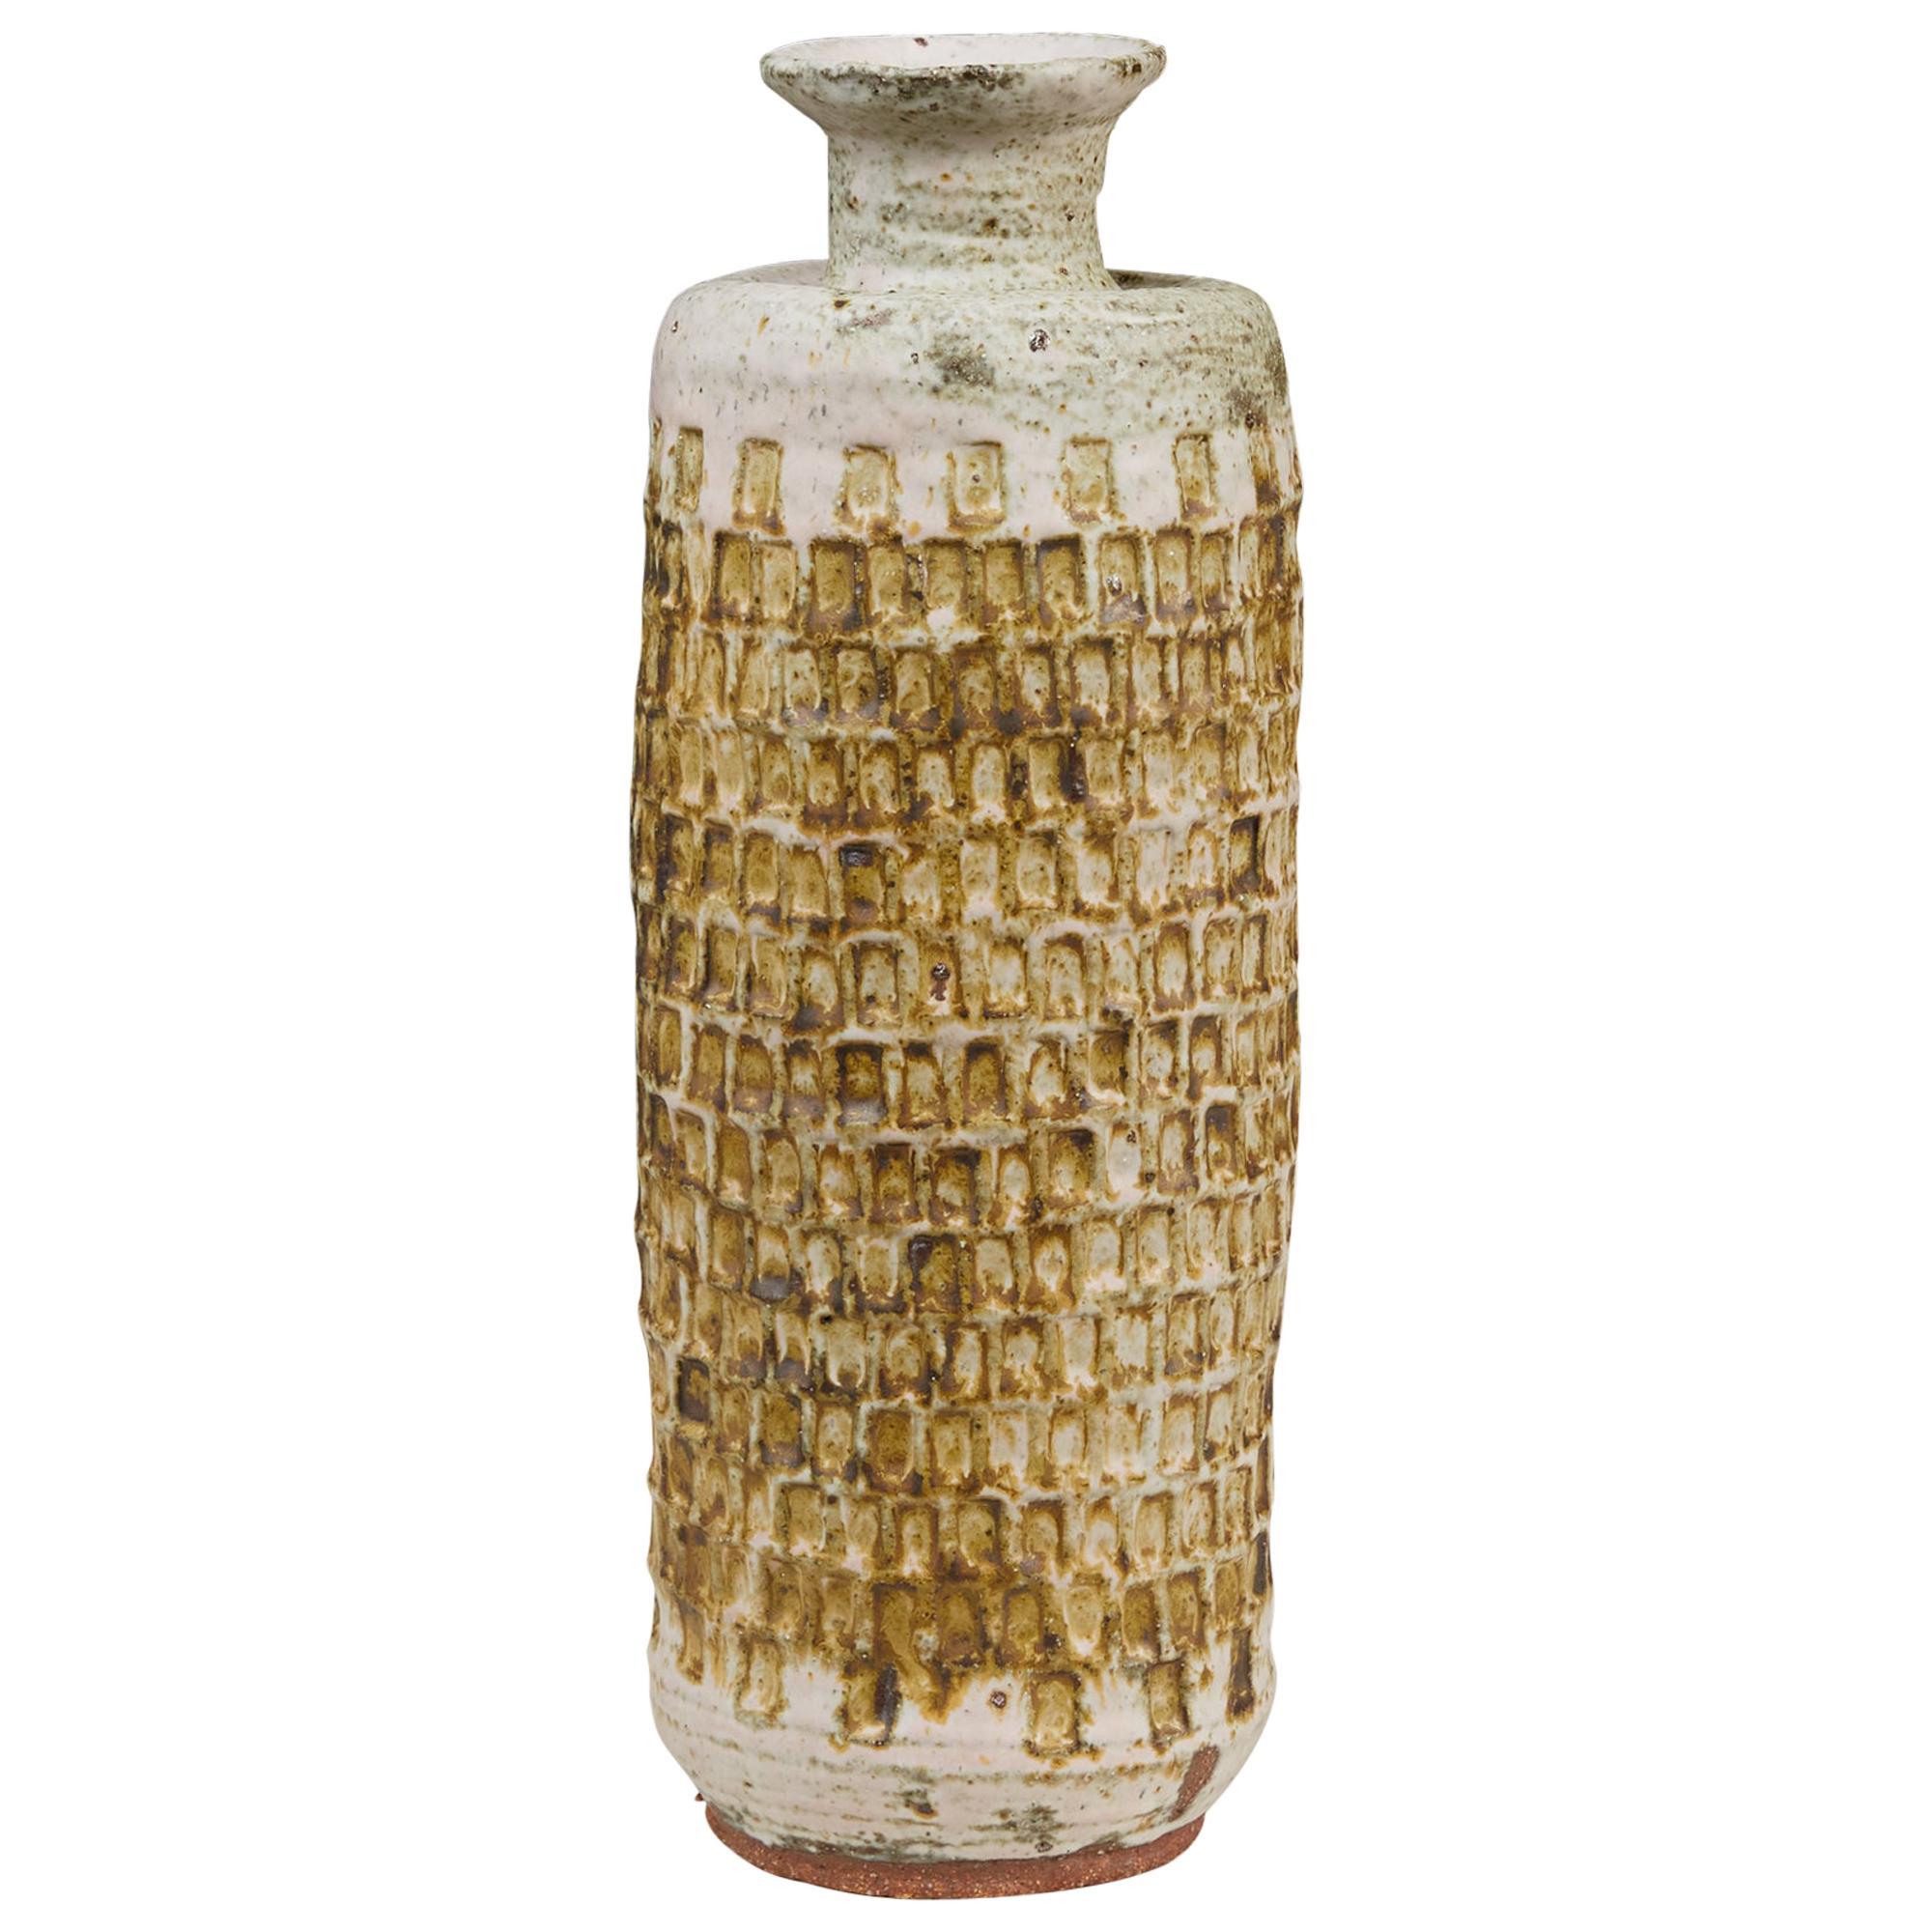 Studio Ceramic Vessel with Incised Geometric Pattern